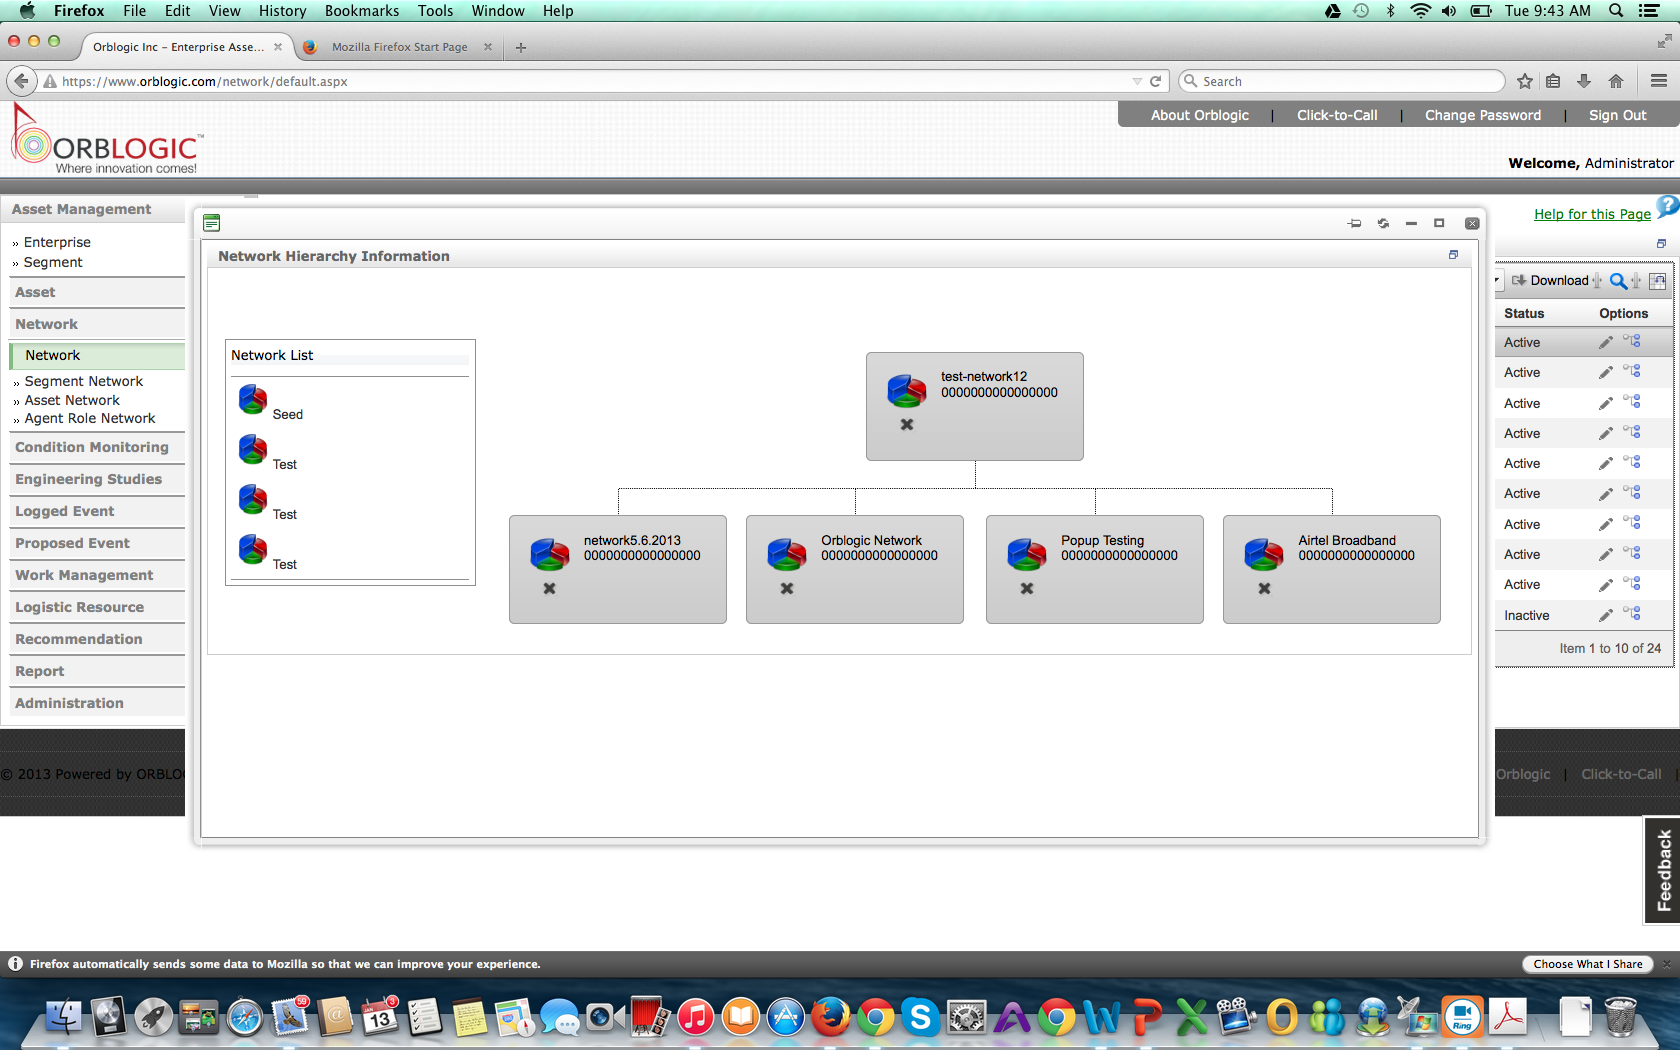 Network Hierarchy Information